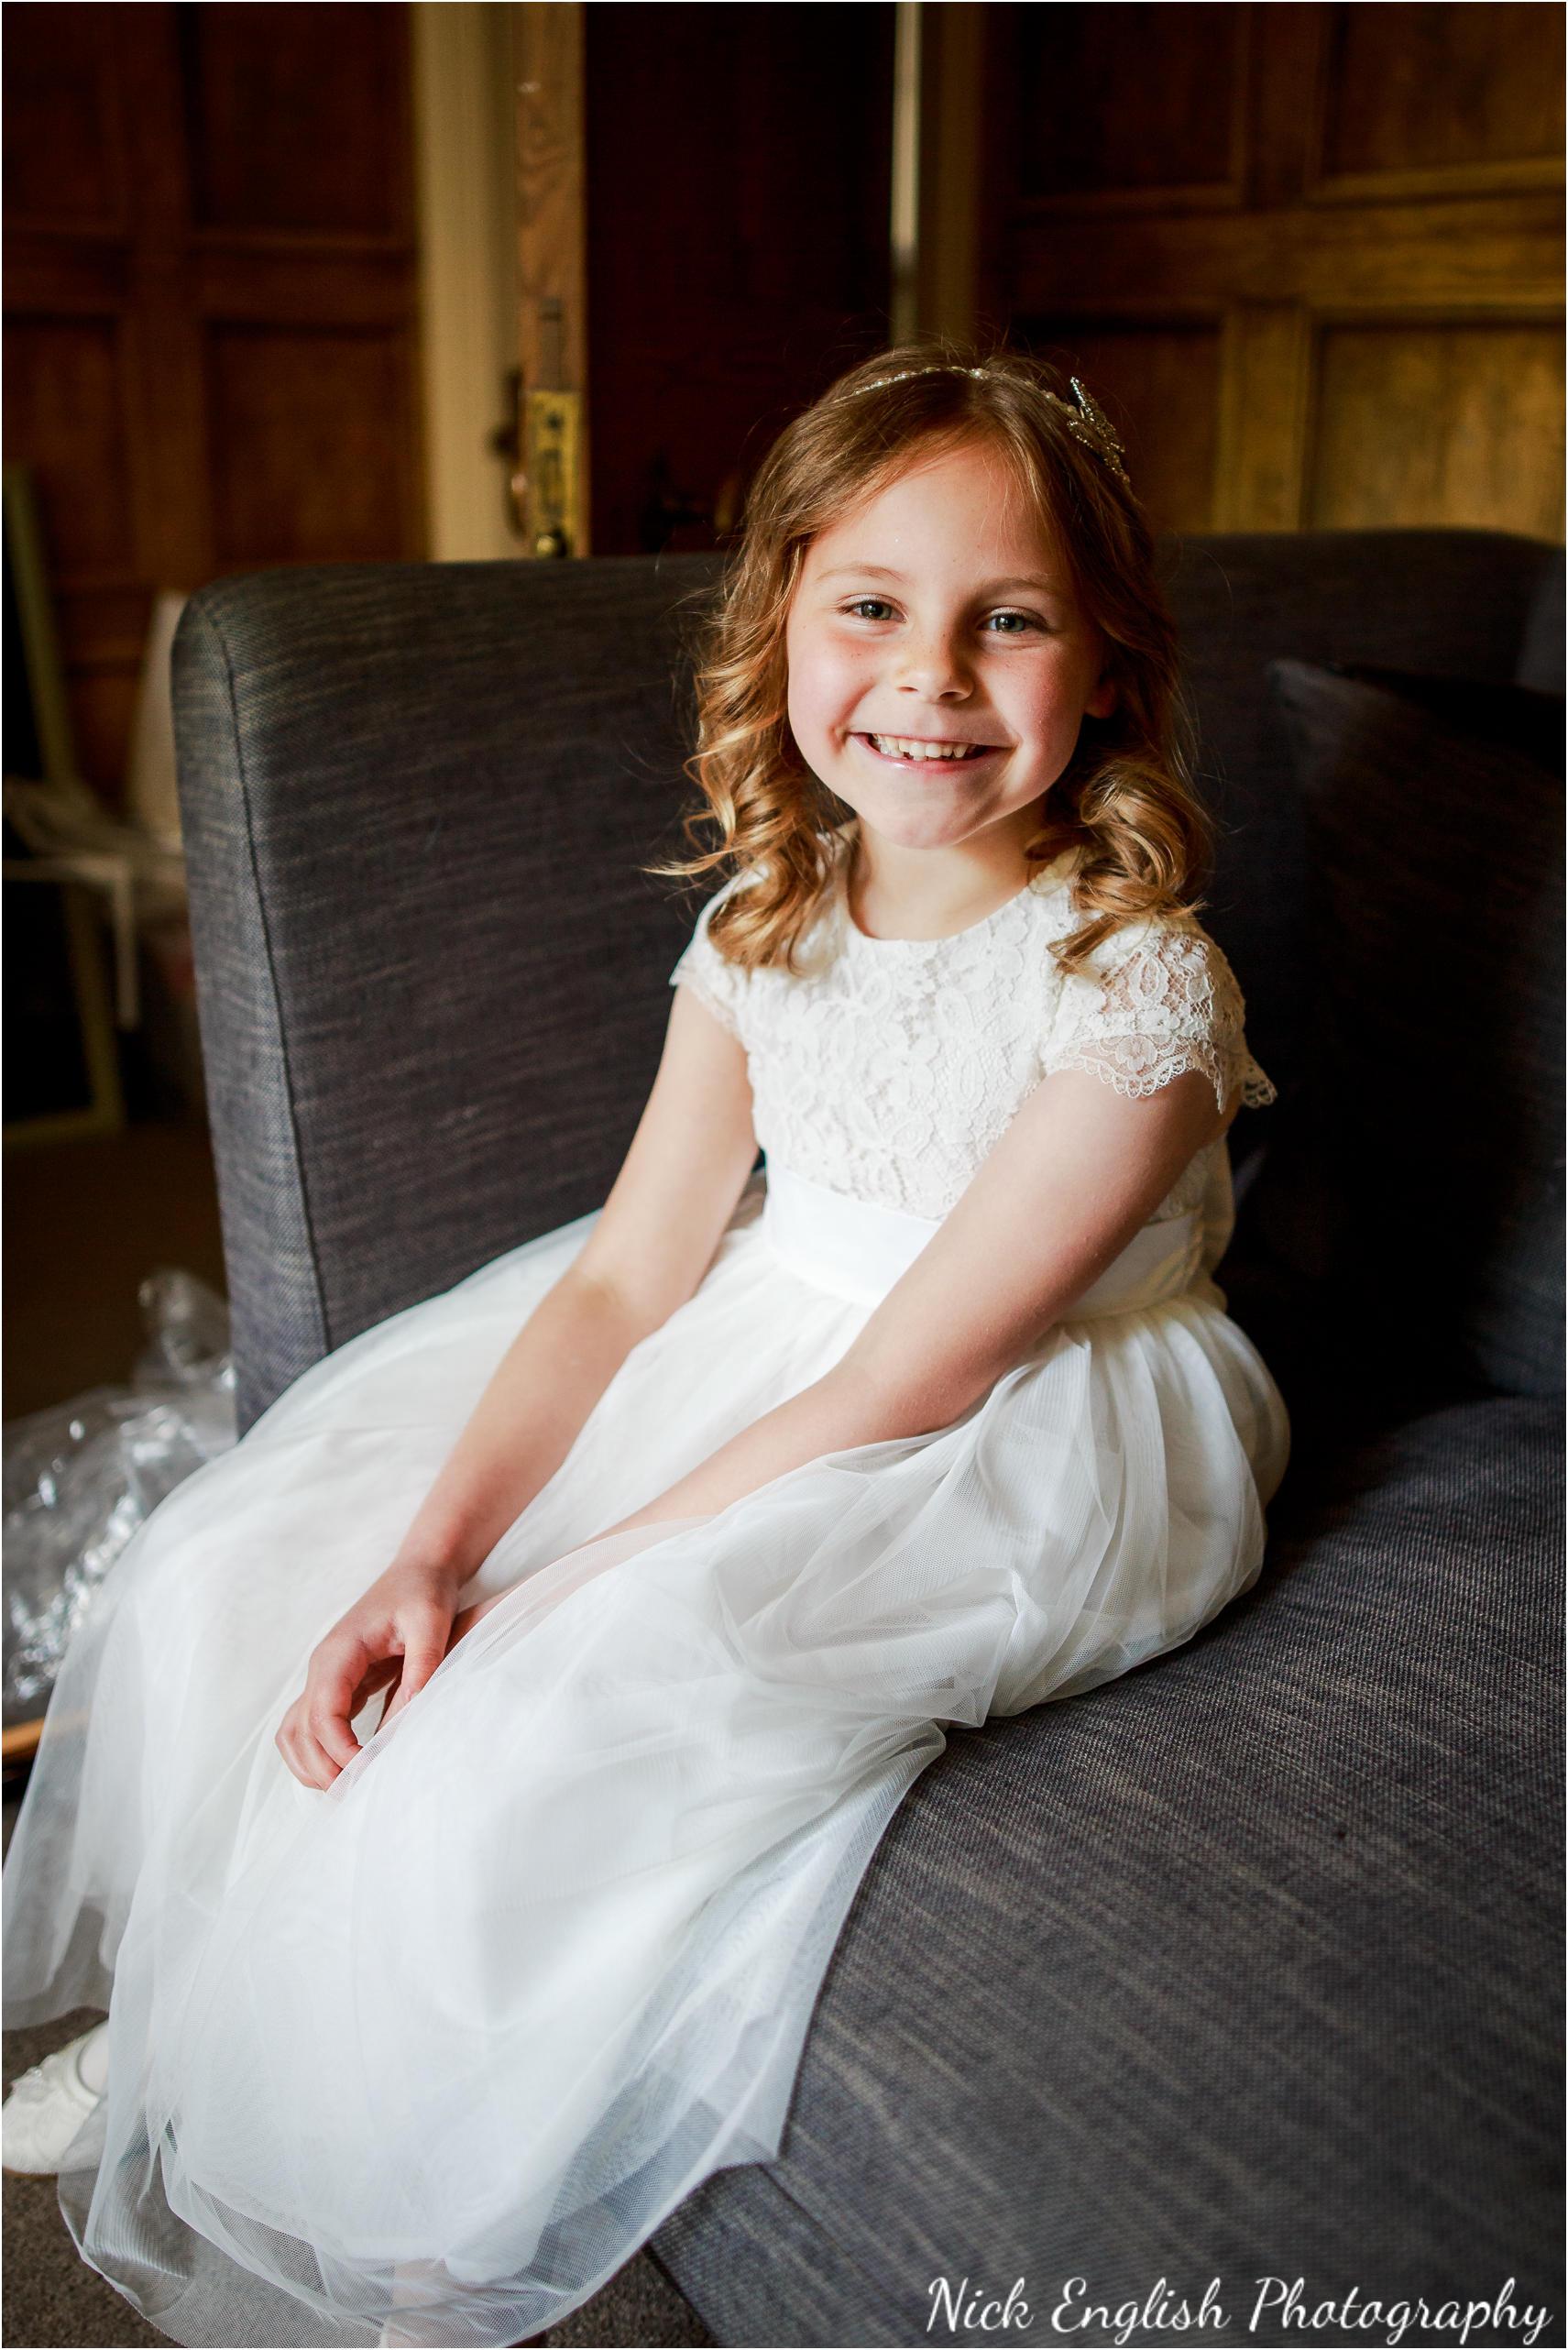 Alison James Wedding Photographs at Eaves Hall West Bradford 53jpg.jpeg